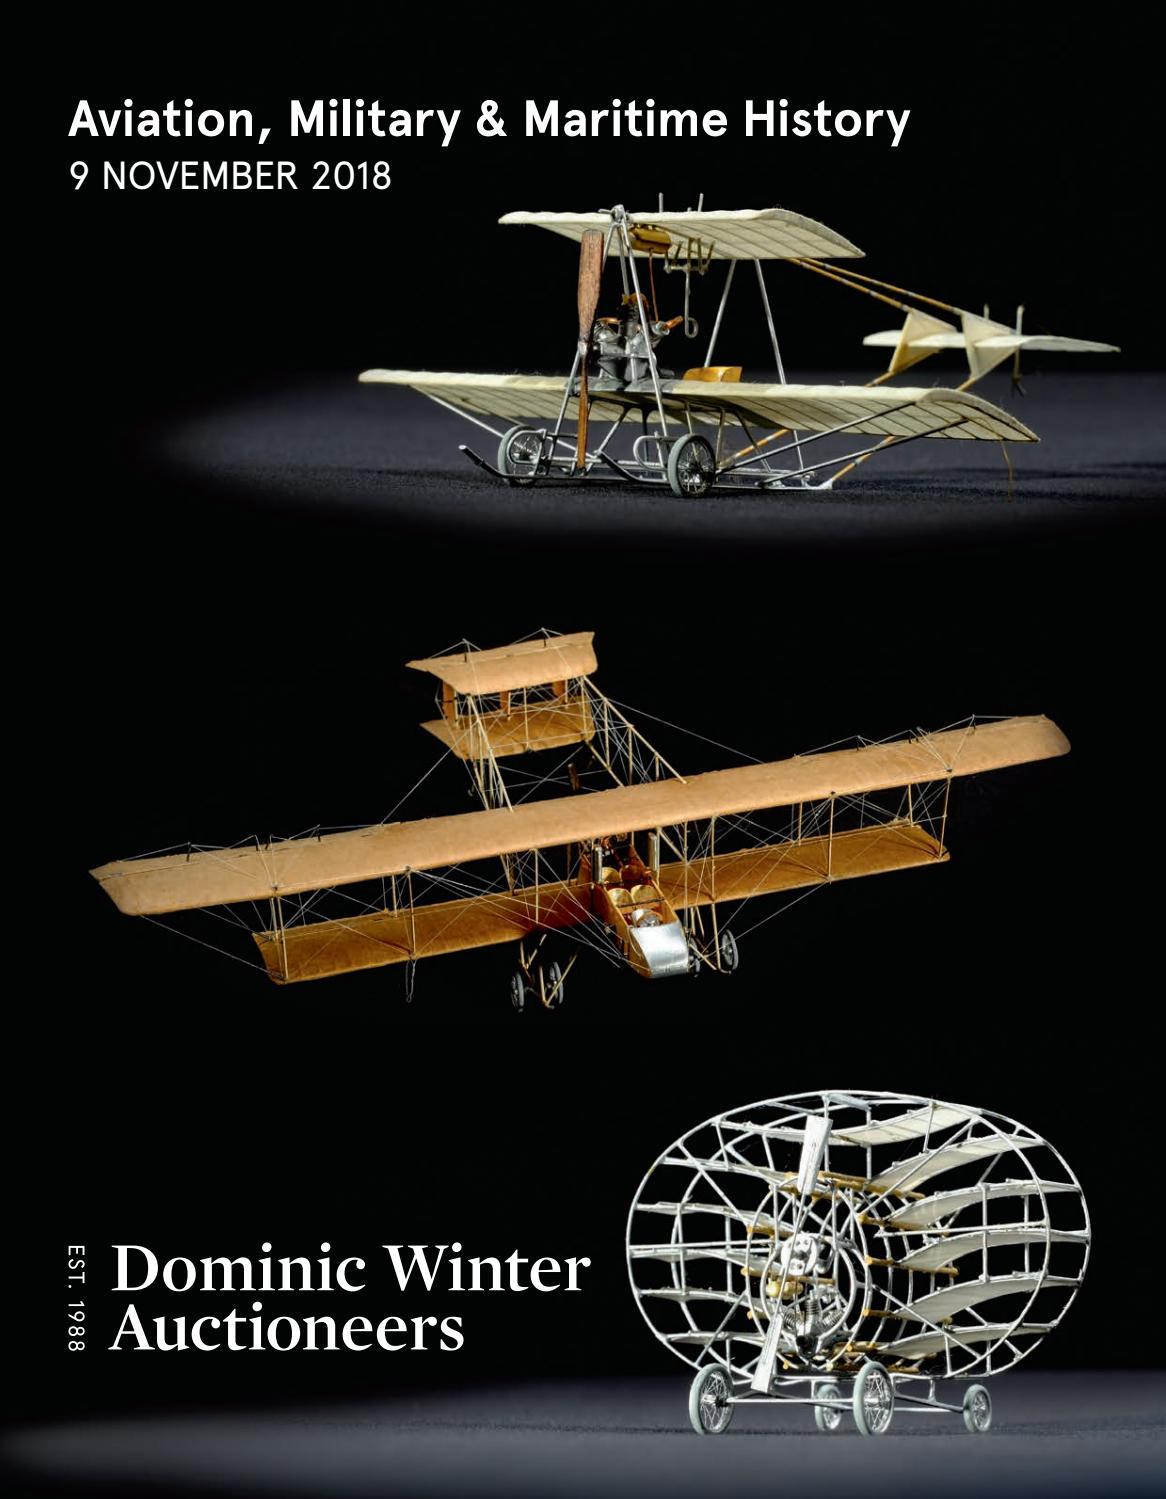 Dominic Winter Auctioneers by Jamm Design Ltd - issuu